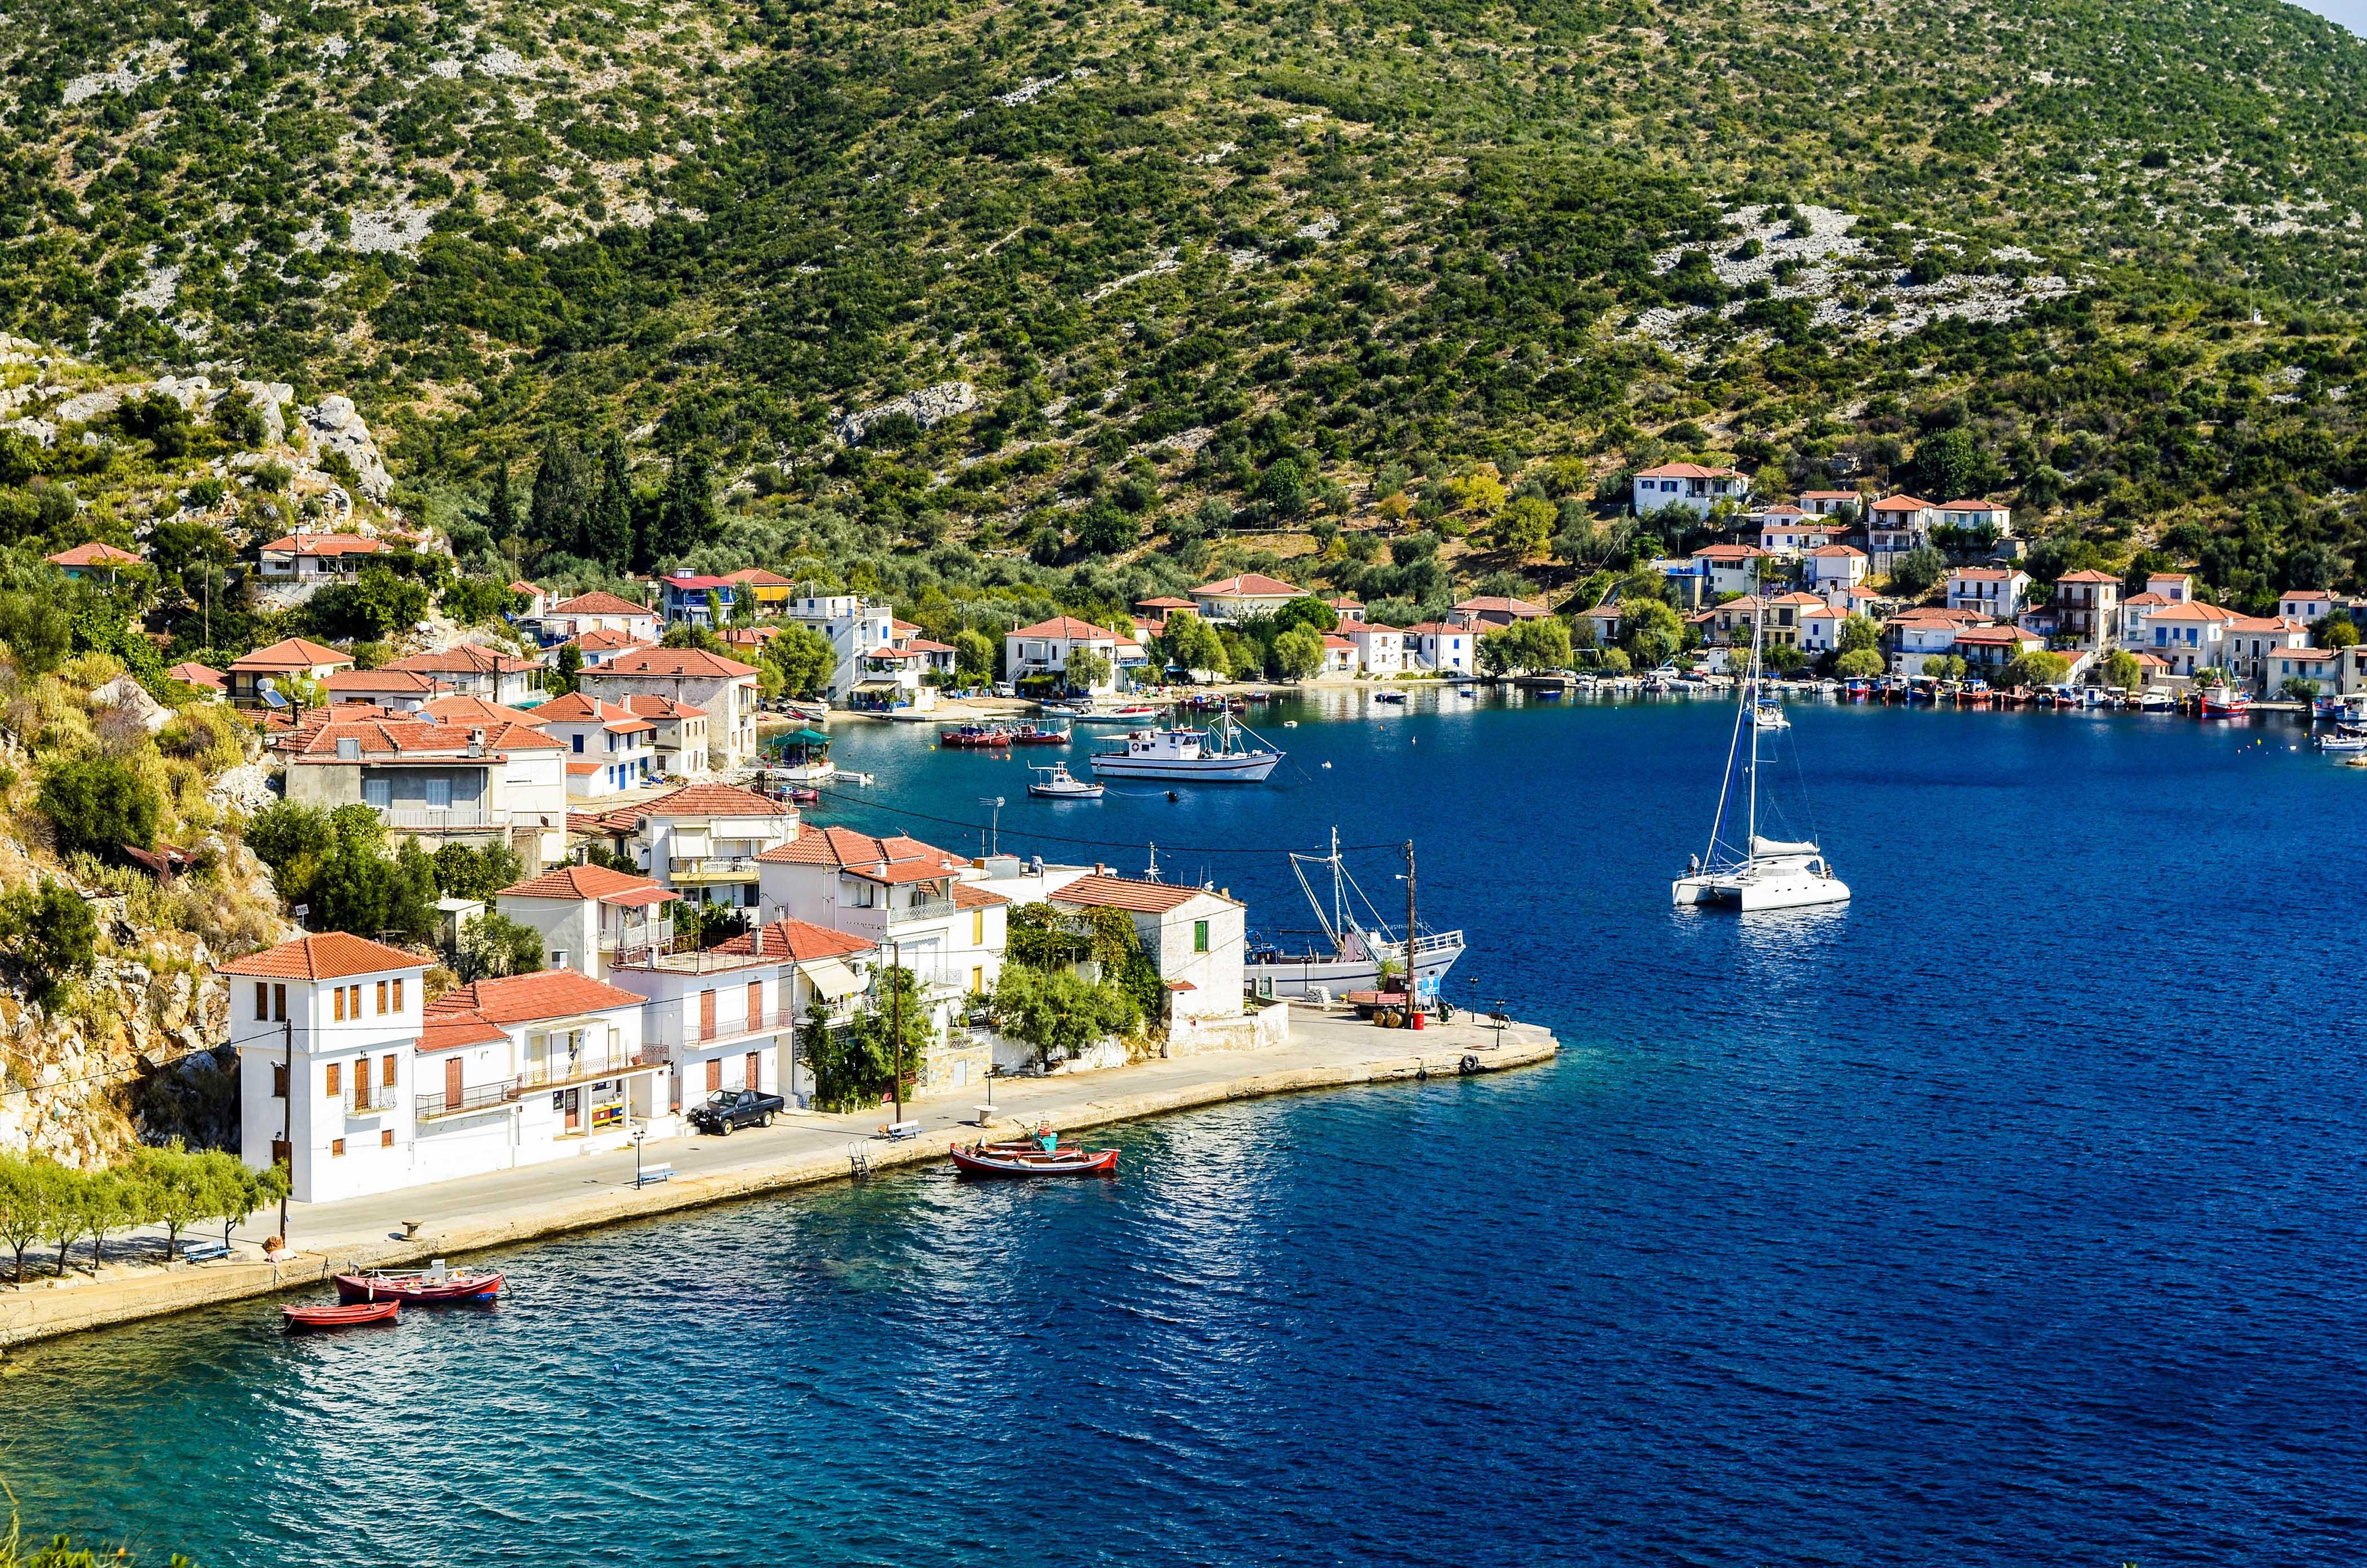 Griechenland Pilion Festland